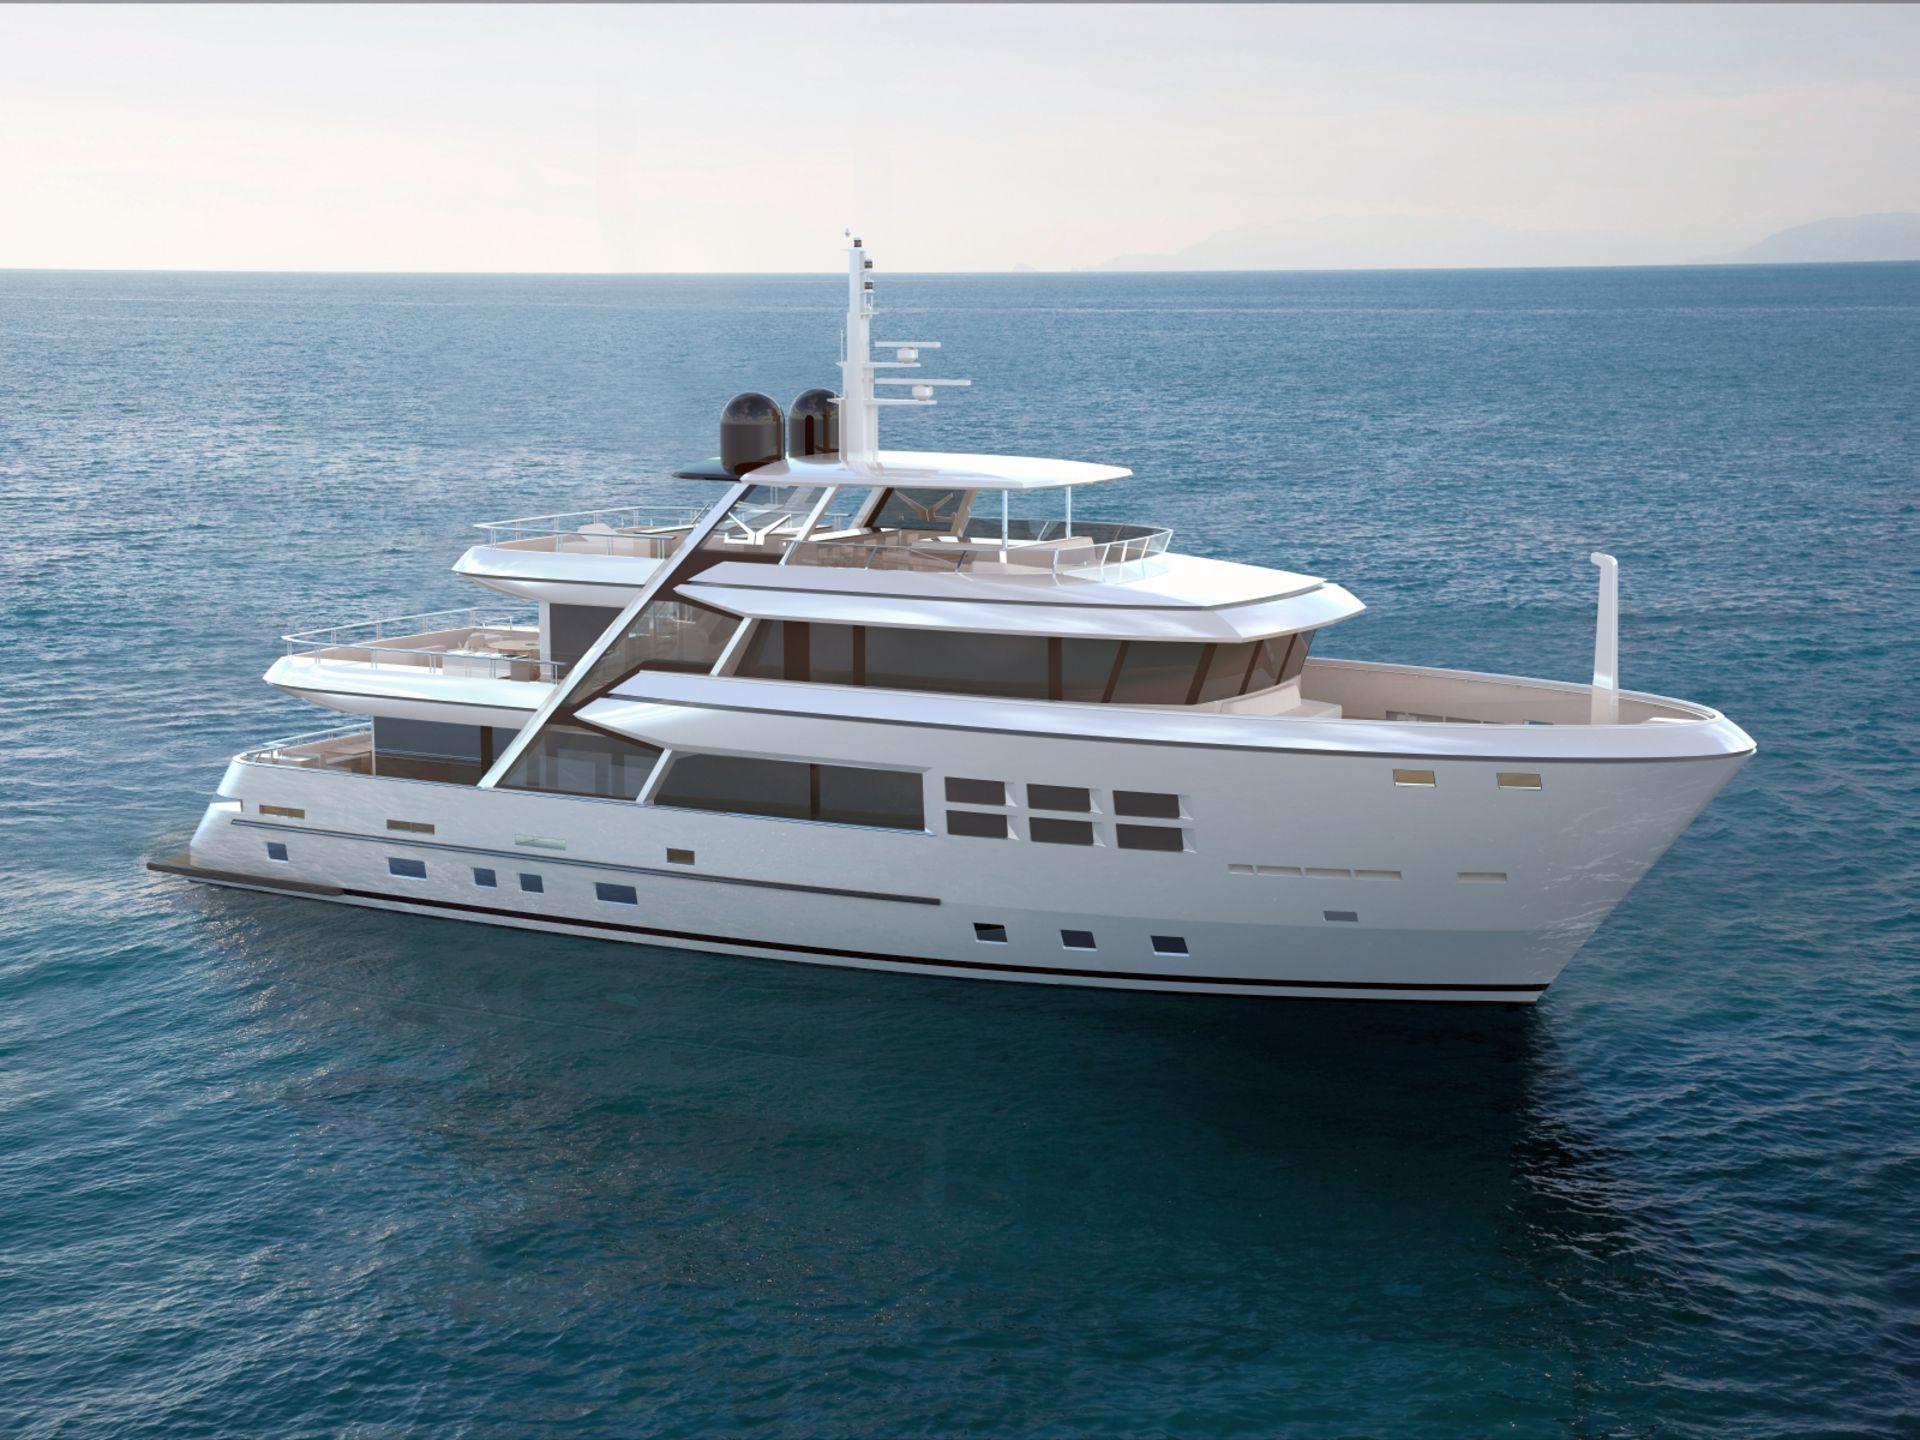 Bandido 122 - Bandido Yachts by Drettmann - Drettmann Yachts